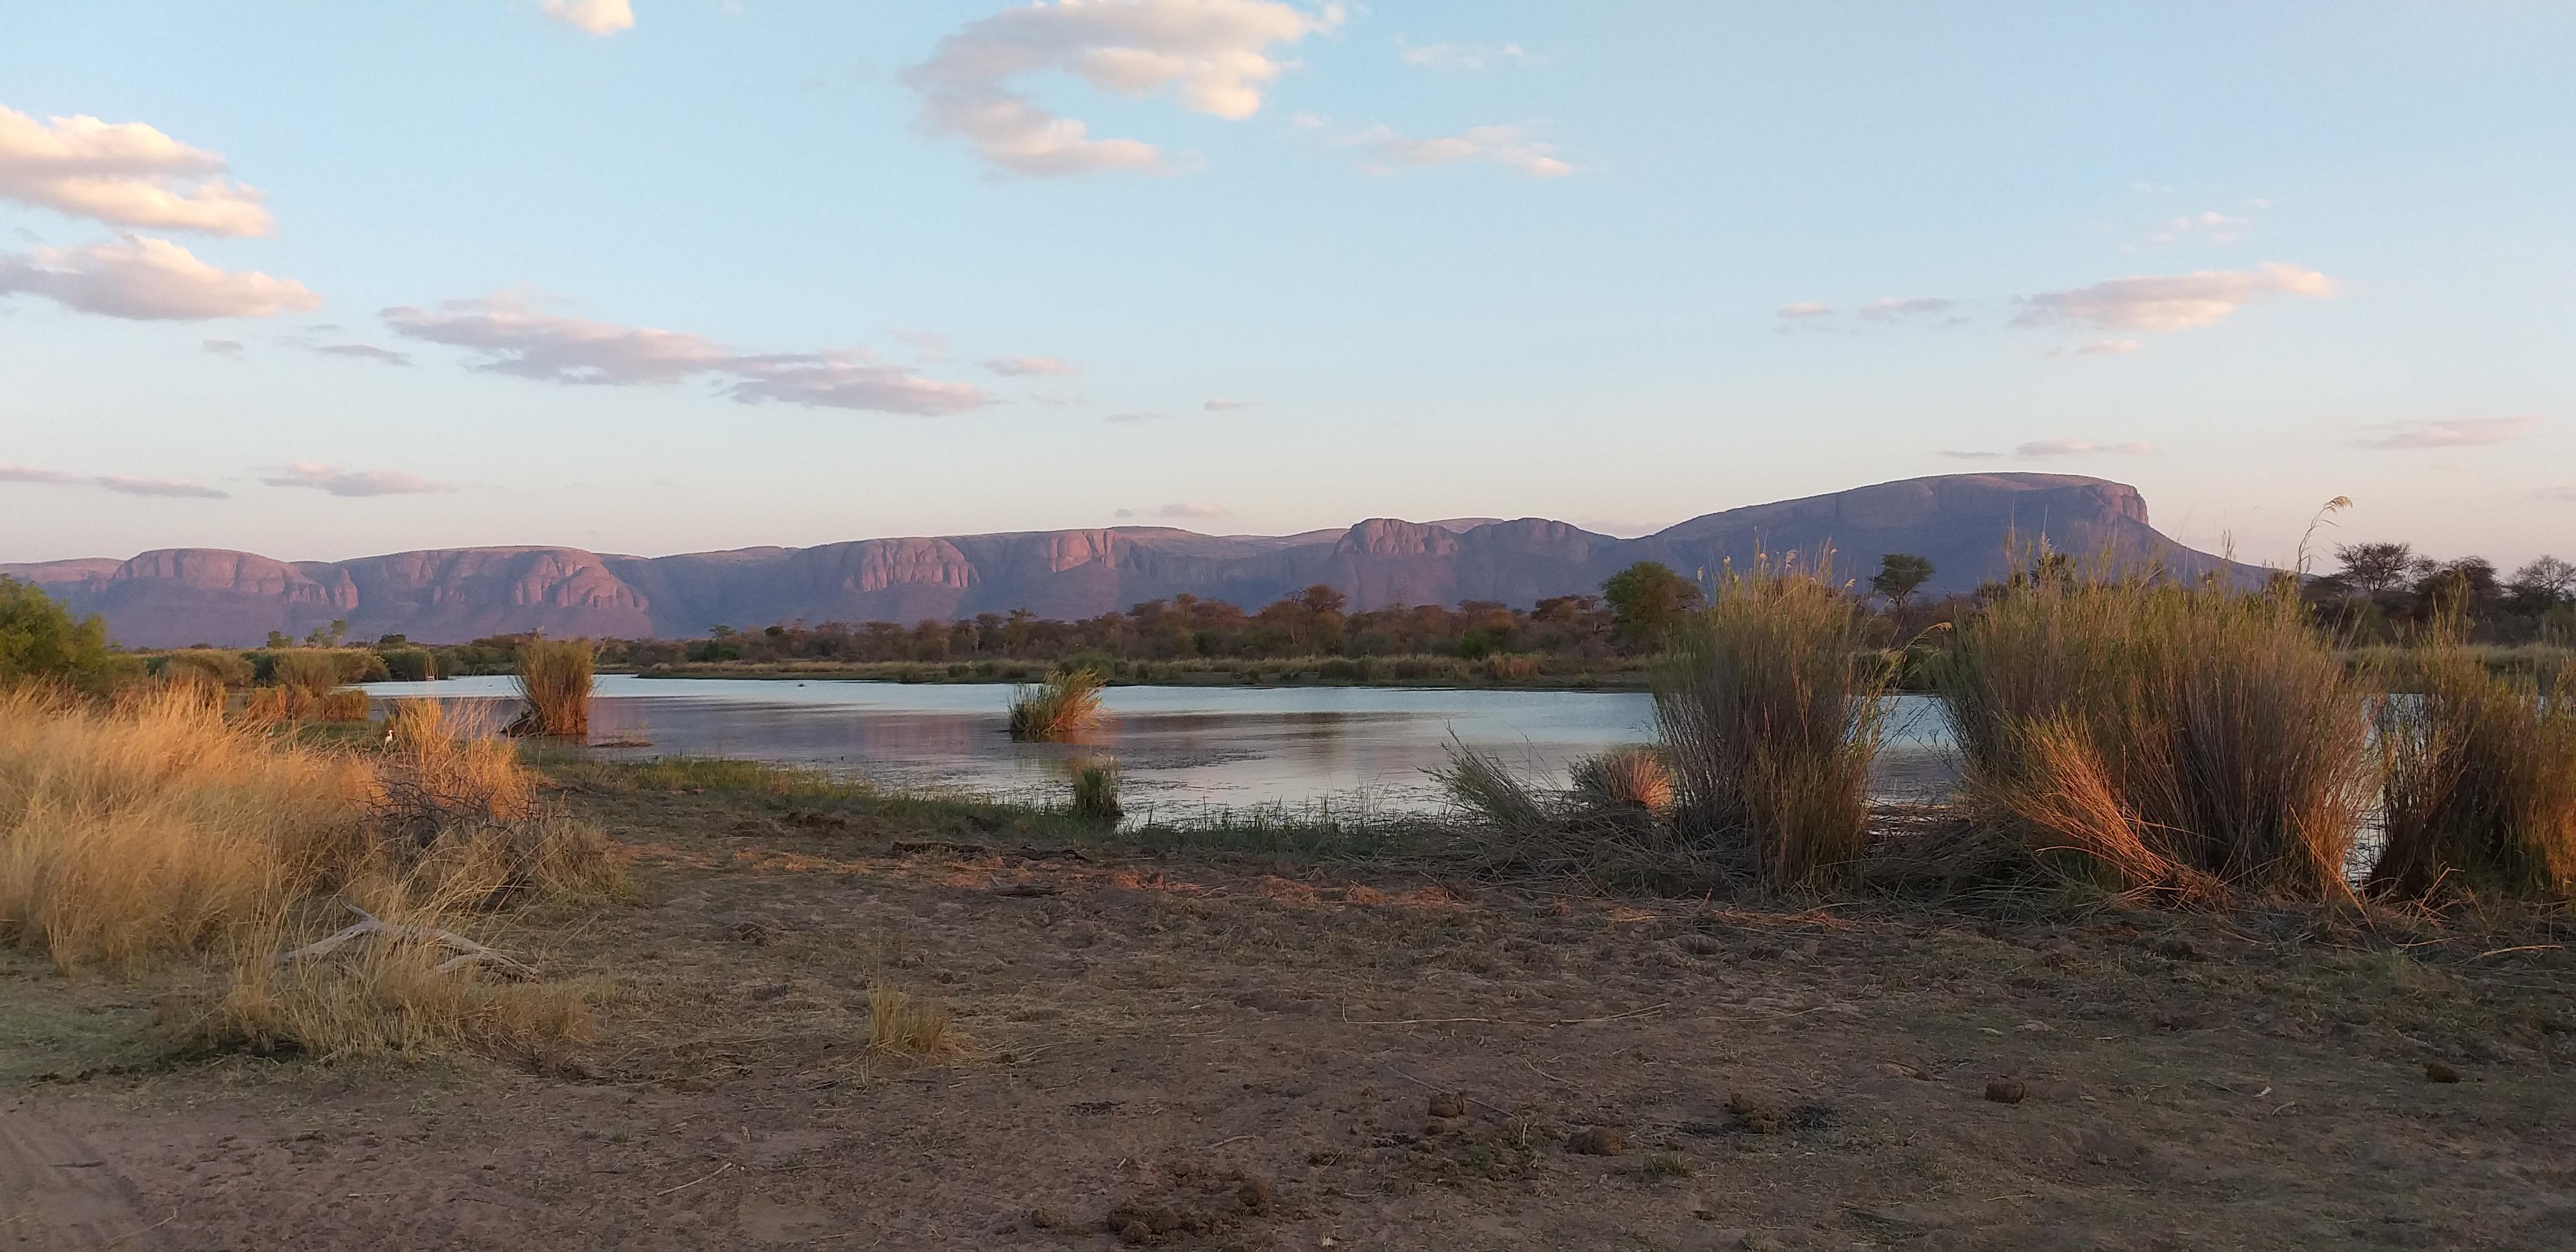 Marataba Reserve in the Waterberg